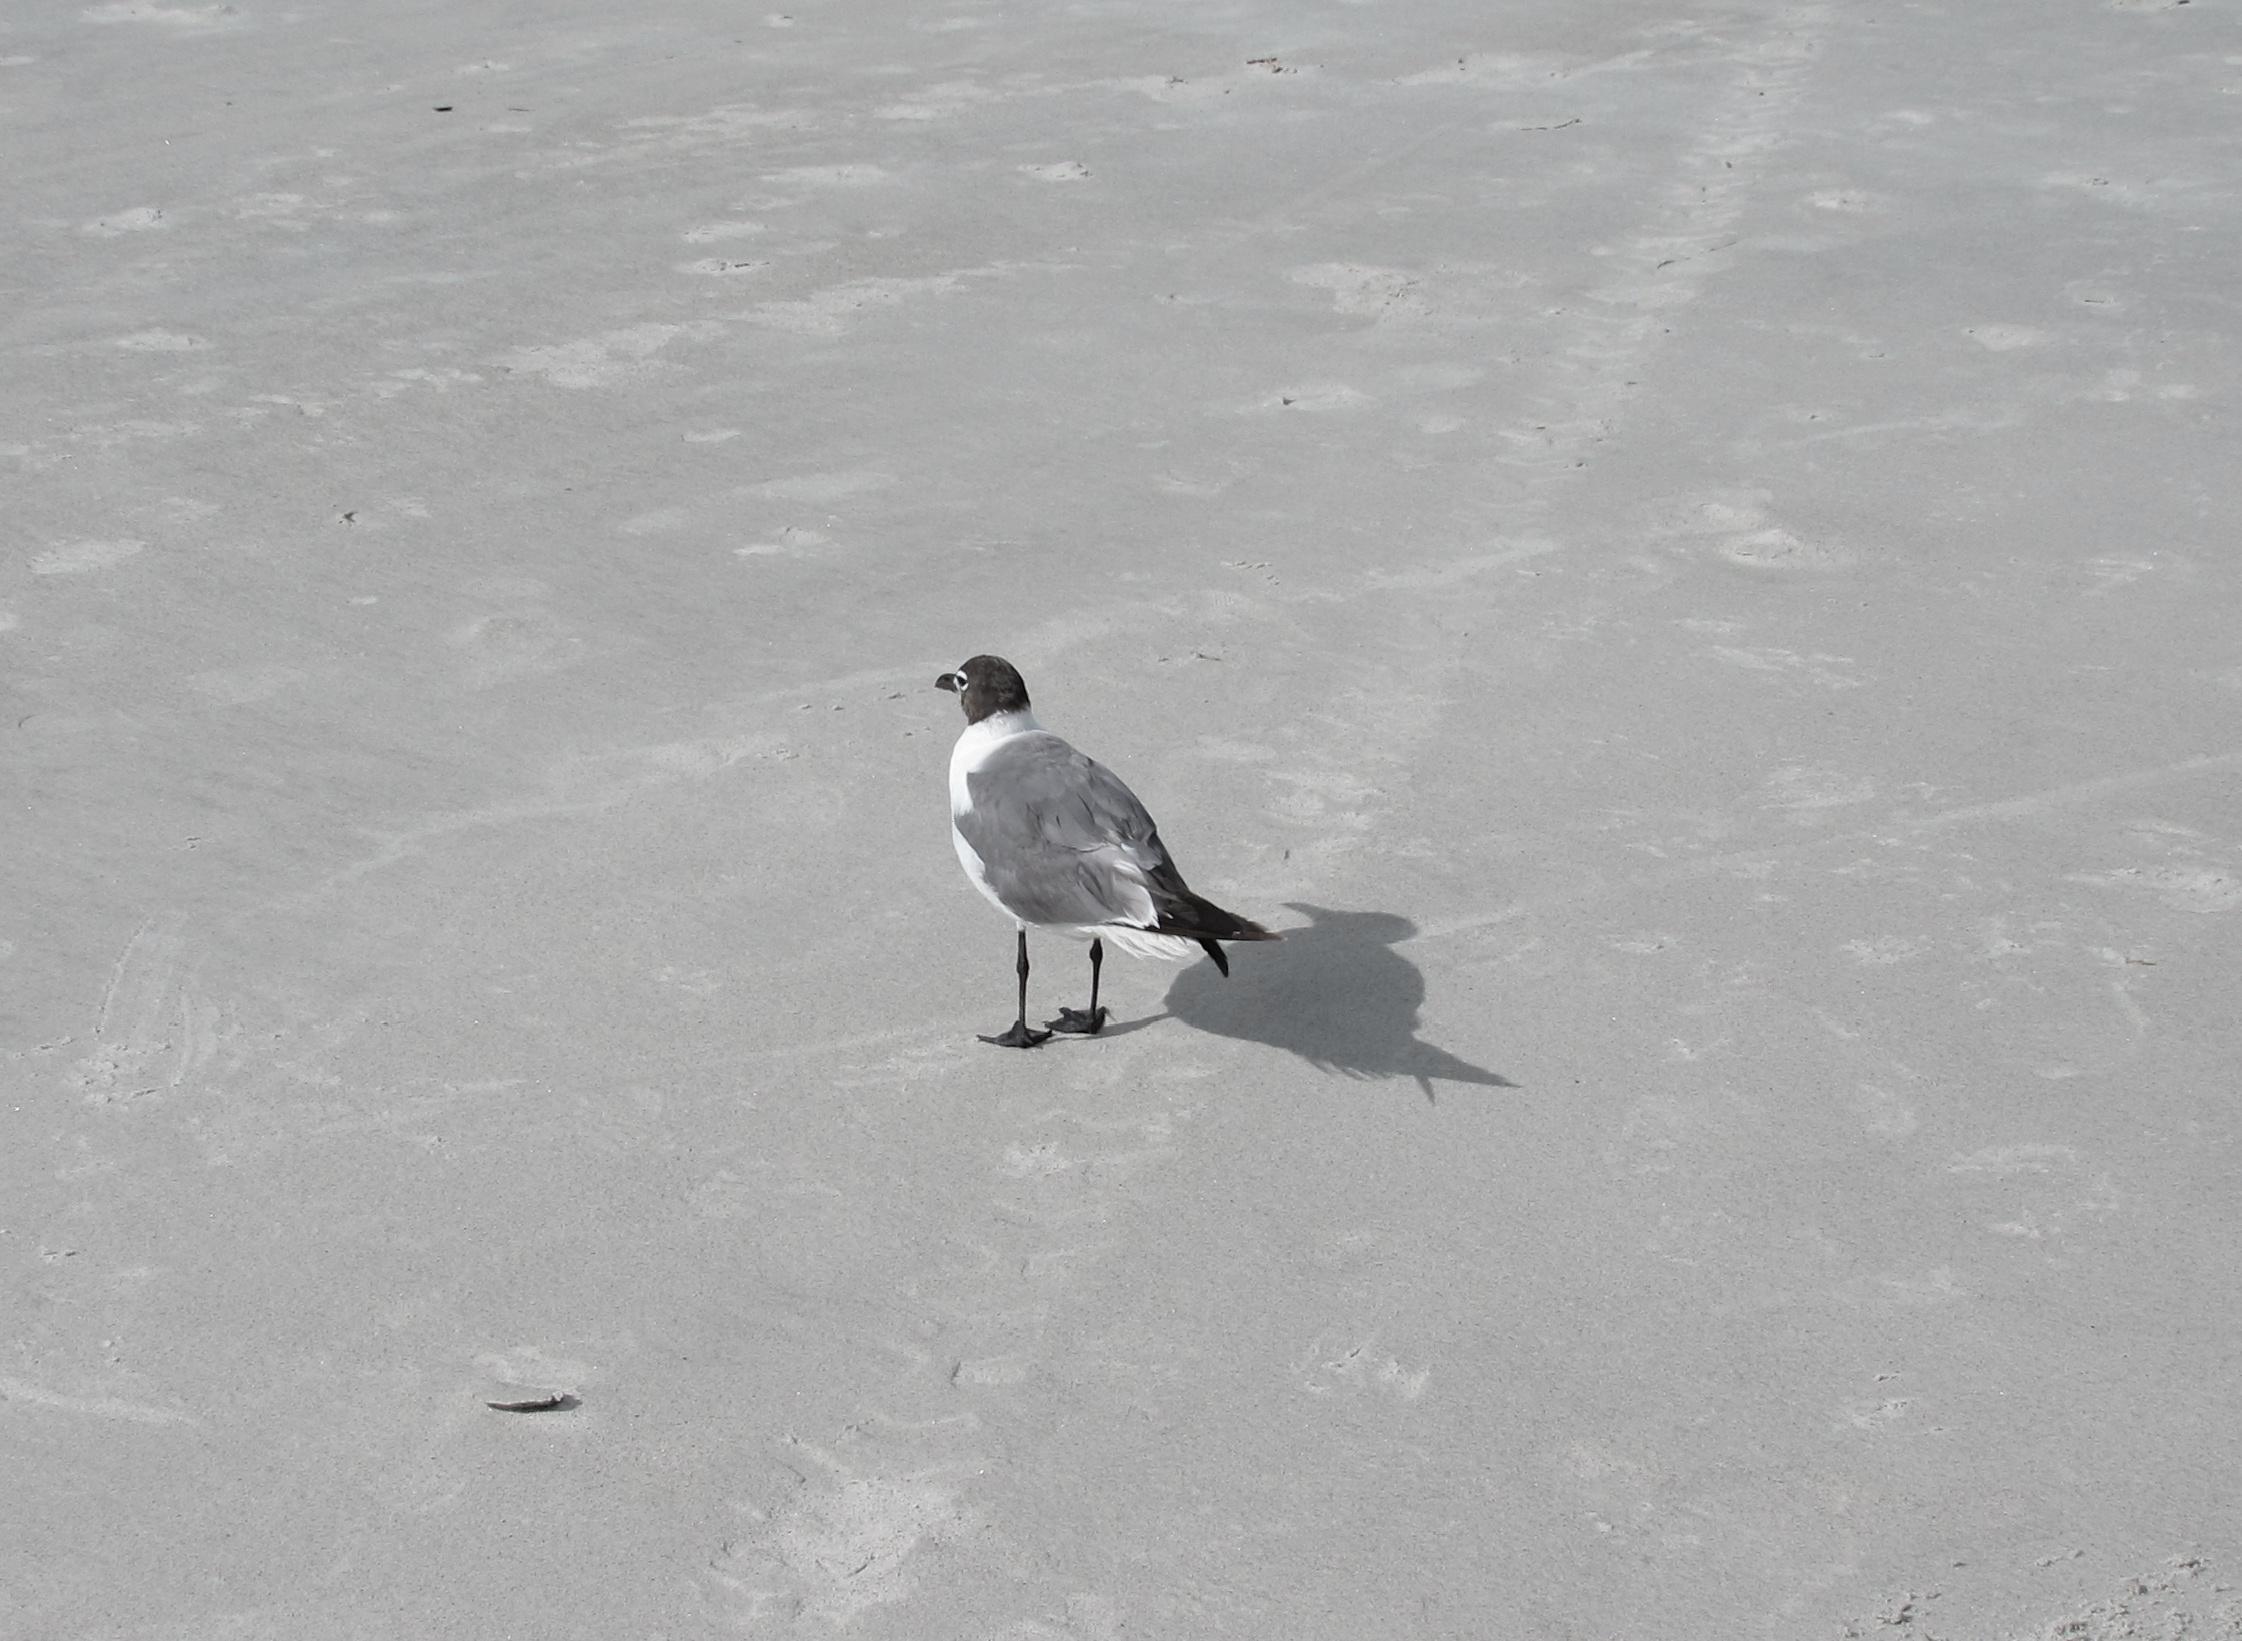 Seagull shadow